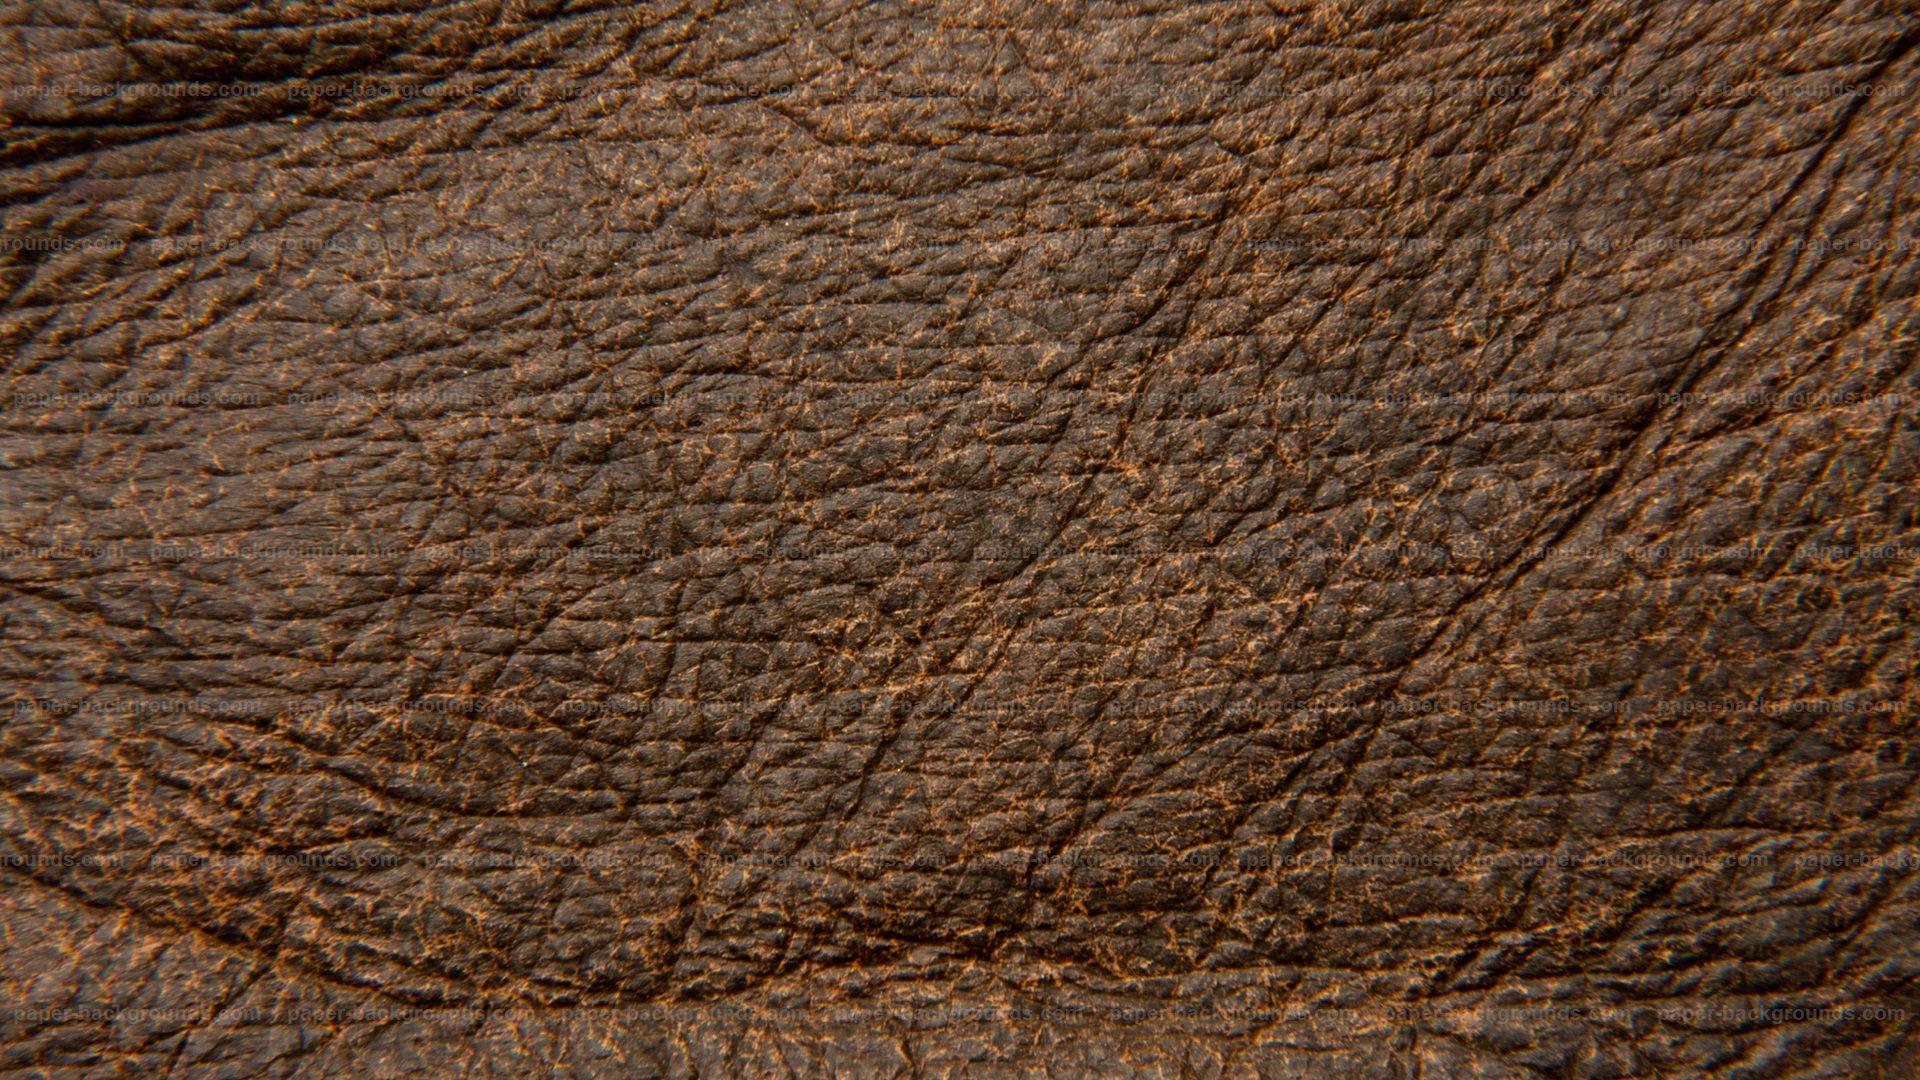 Black-Leather-HD-desktop-High-Definition-1920x1080-wallpaper-wp3403298